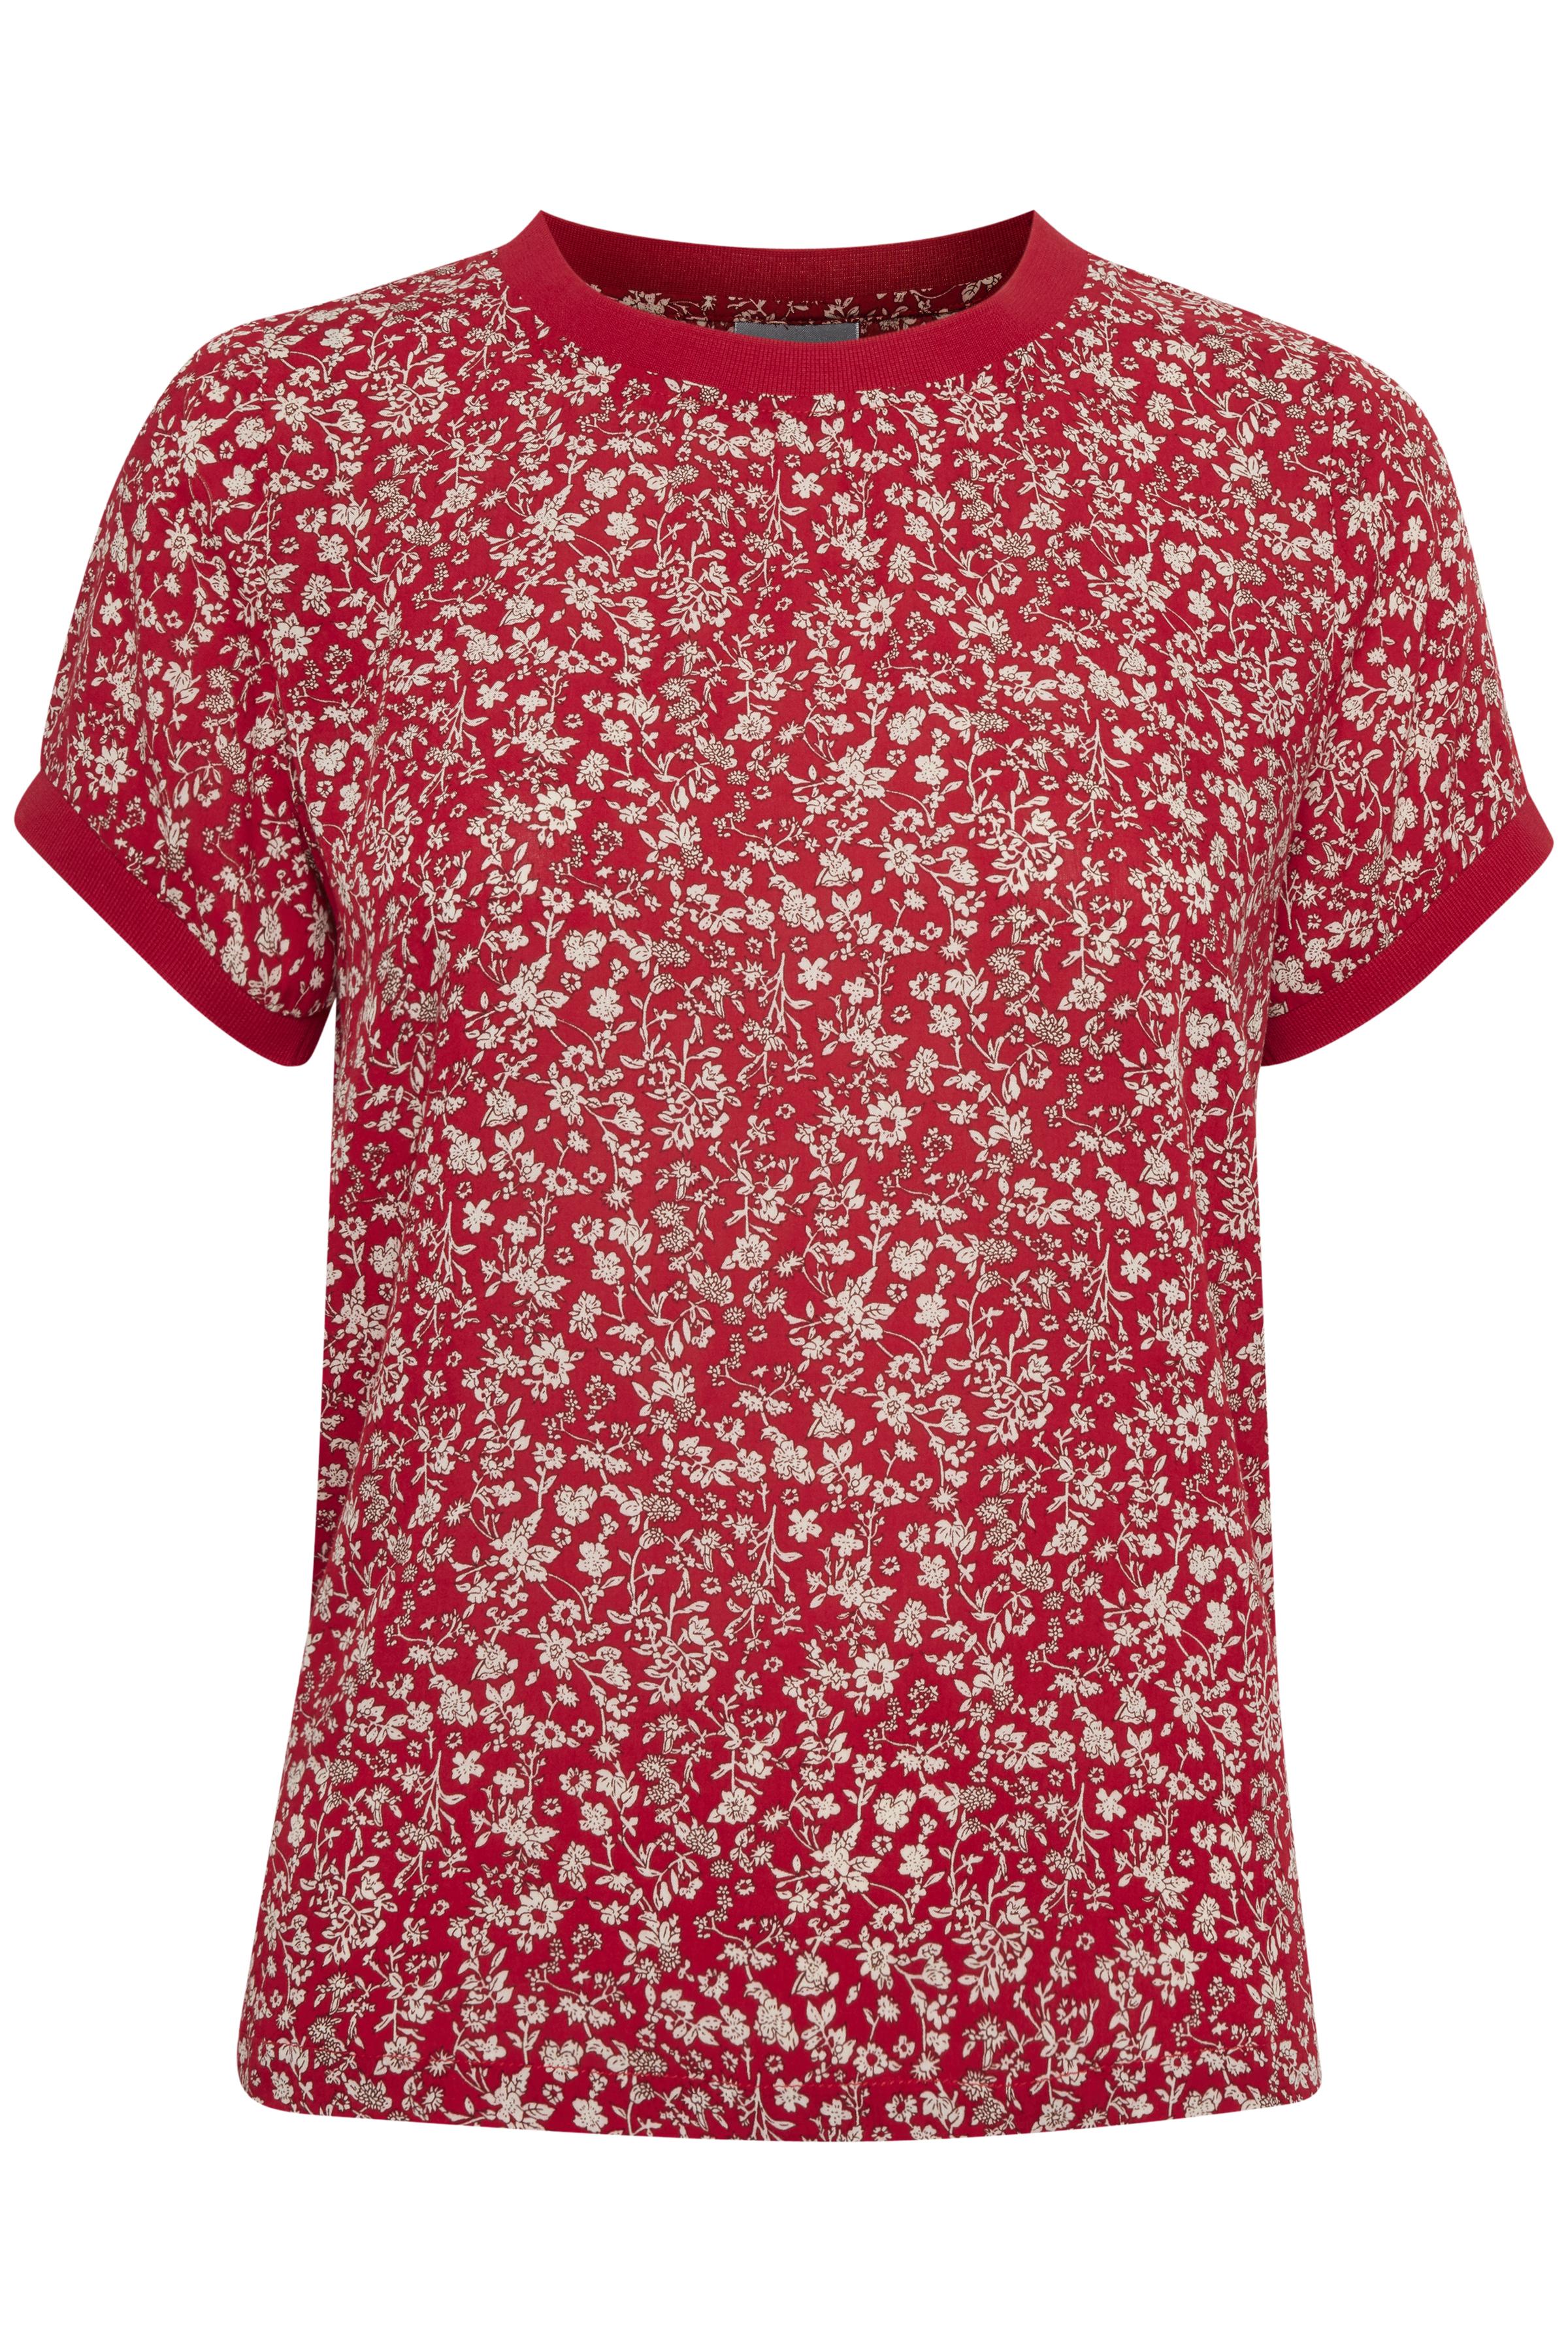 Rød/off-white Kortærmet bluse fra Fransa – Køb Rød/off-white Kortærmet bluse fra str. XS-XXL her